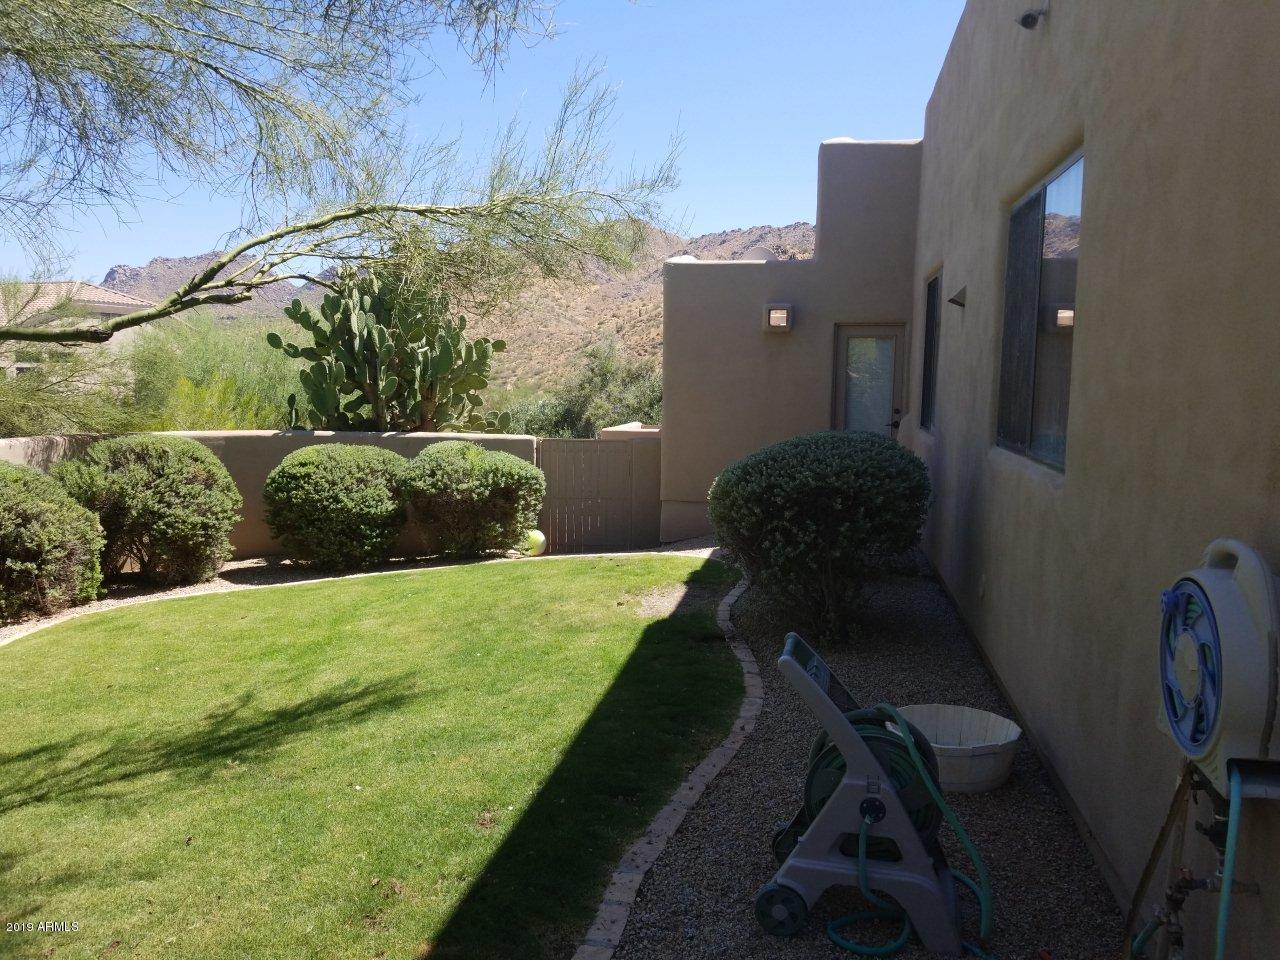 MLS 5972219 11482 E JUAN TABO Road, Scottsdale, AZ 85255 Scottsdale AZ Private Pool